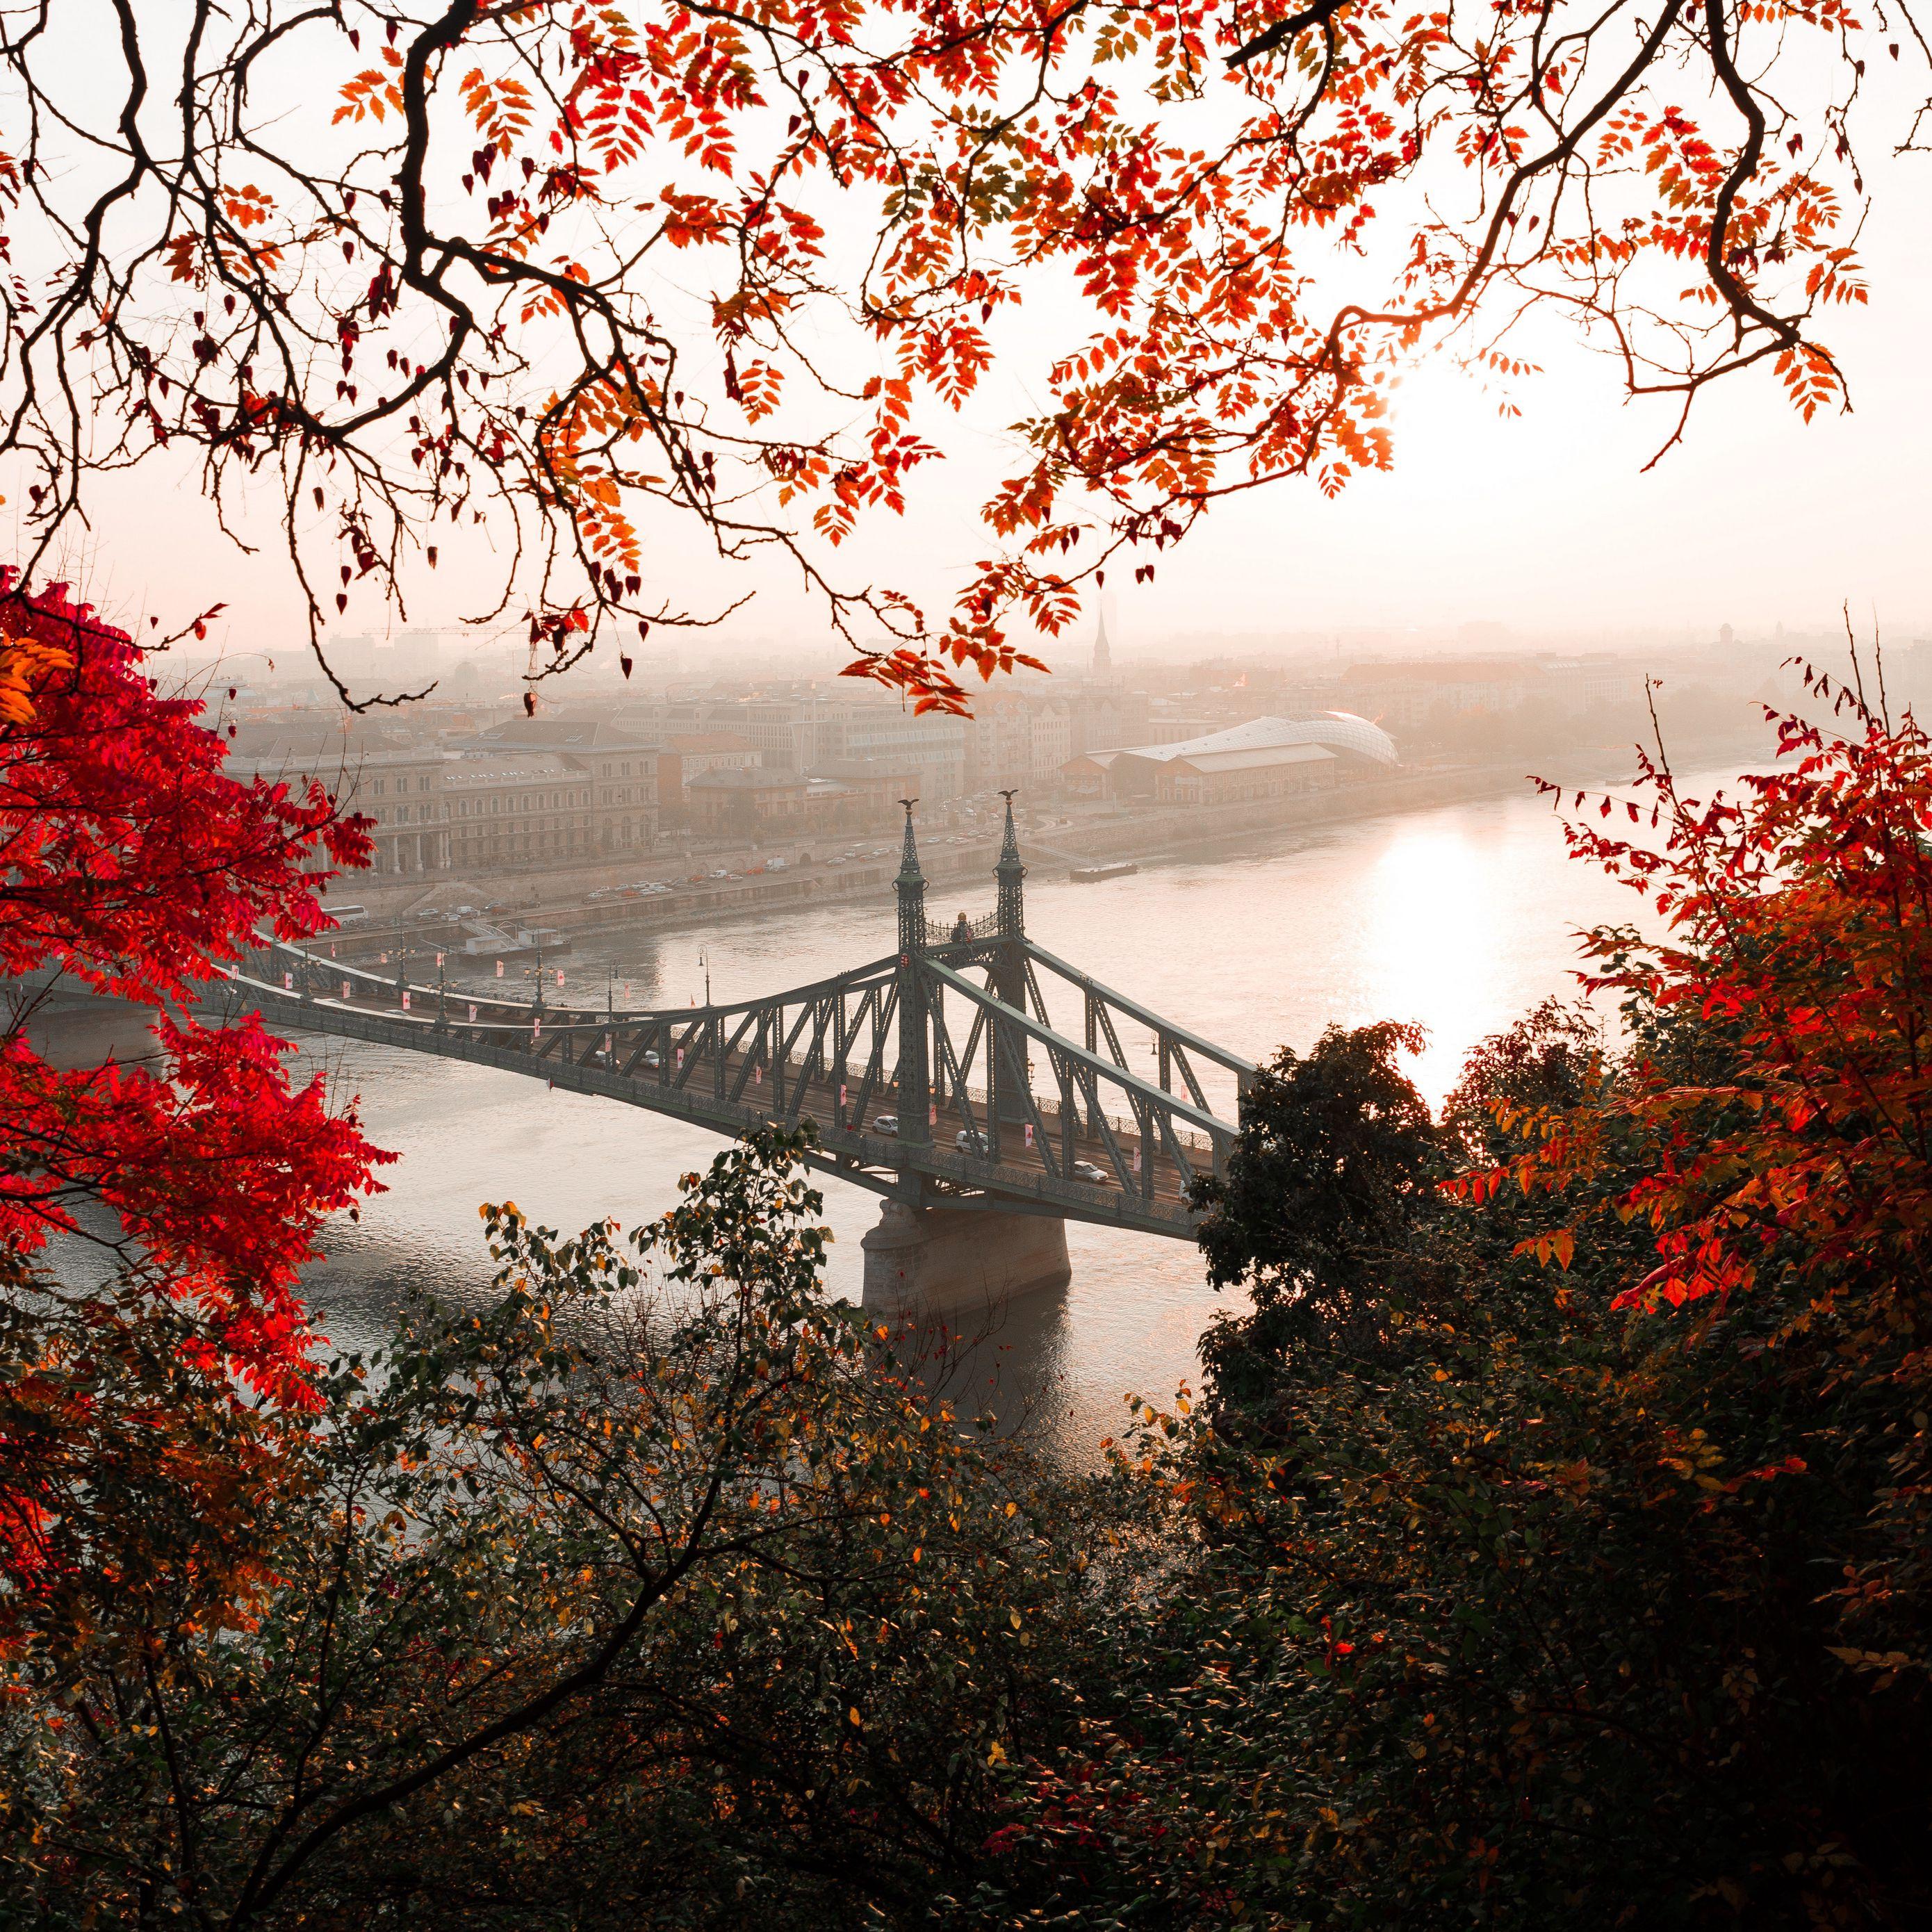 2780x2780 Wallpaper bridge, autumn, city, citadella, budapest, hungary